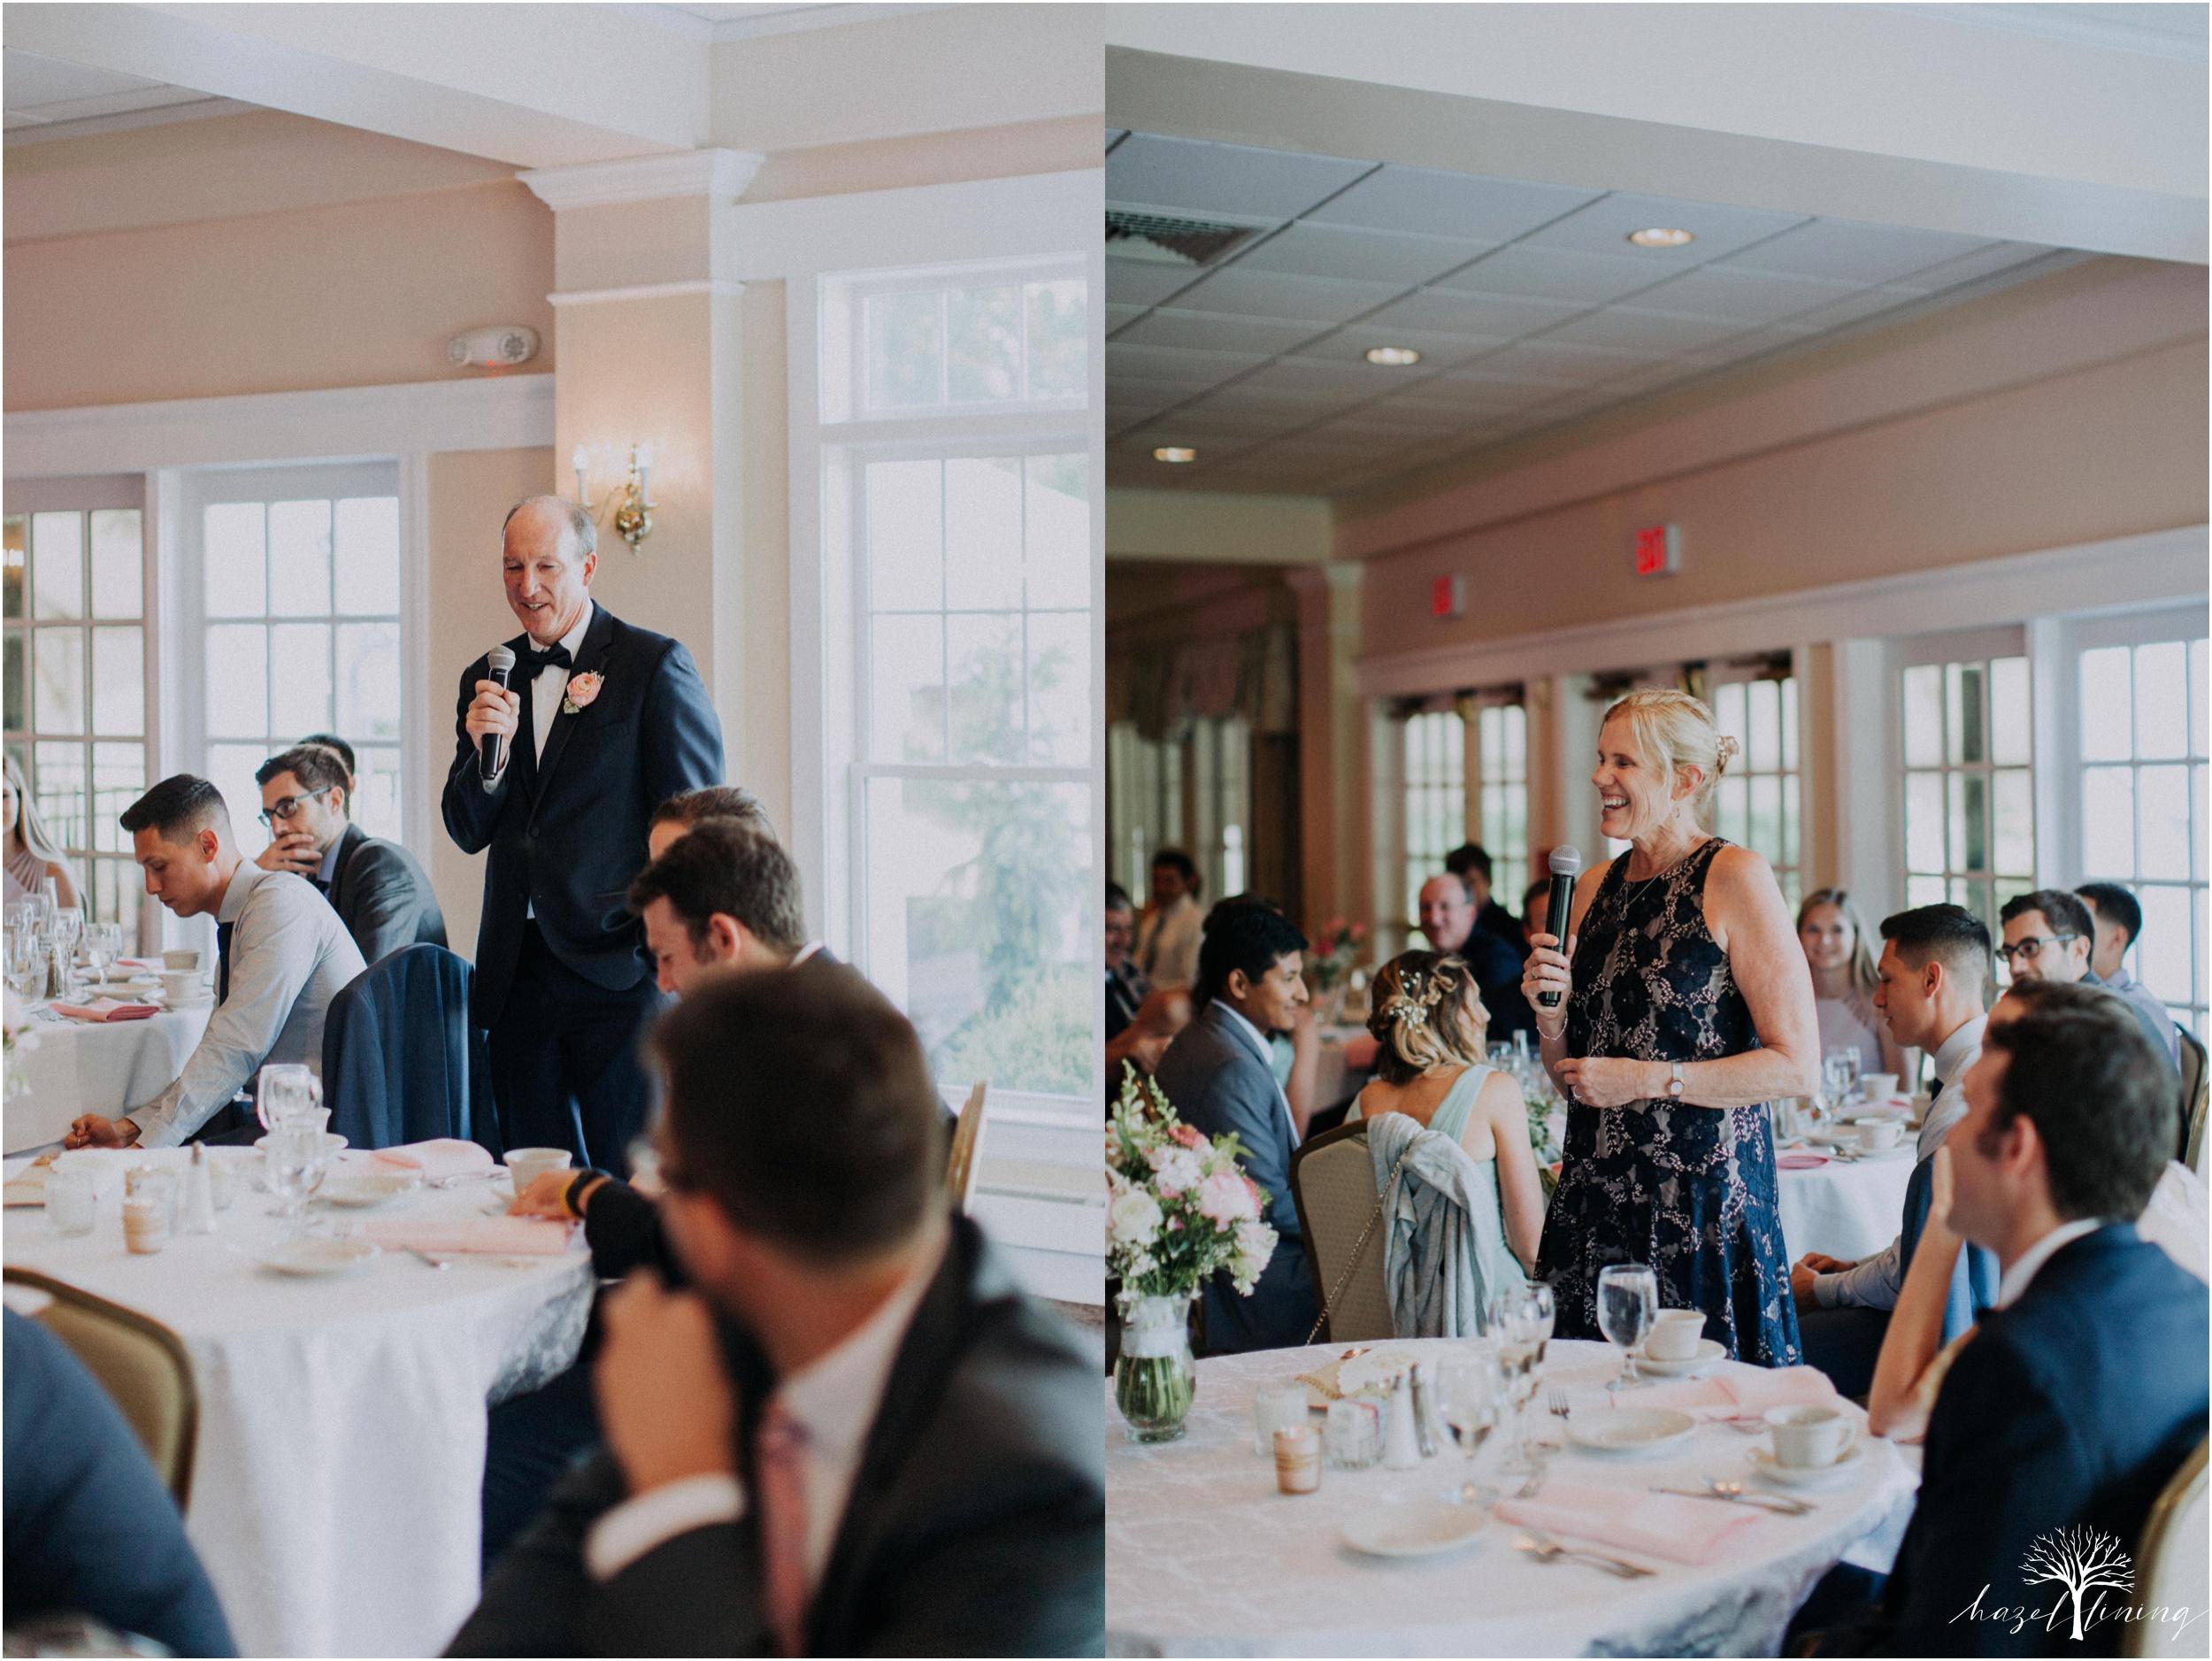 hazel-lining-travel-wedding-elopement-photography_0142.jpg